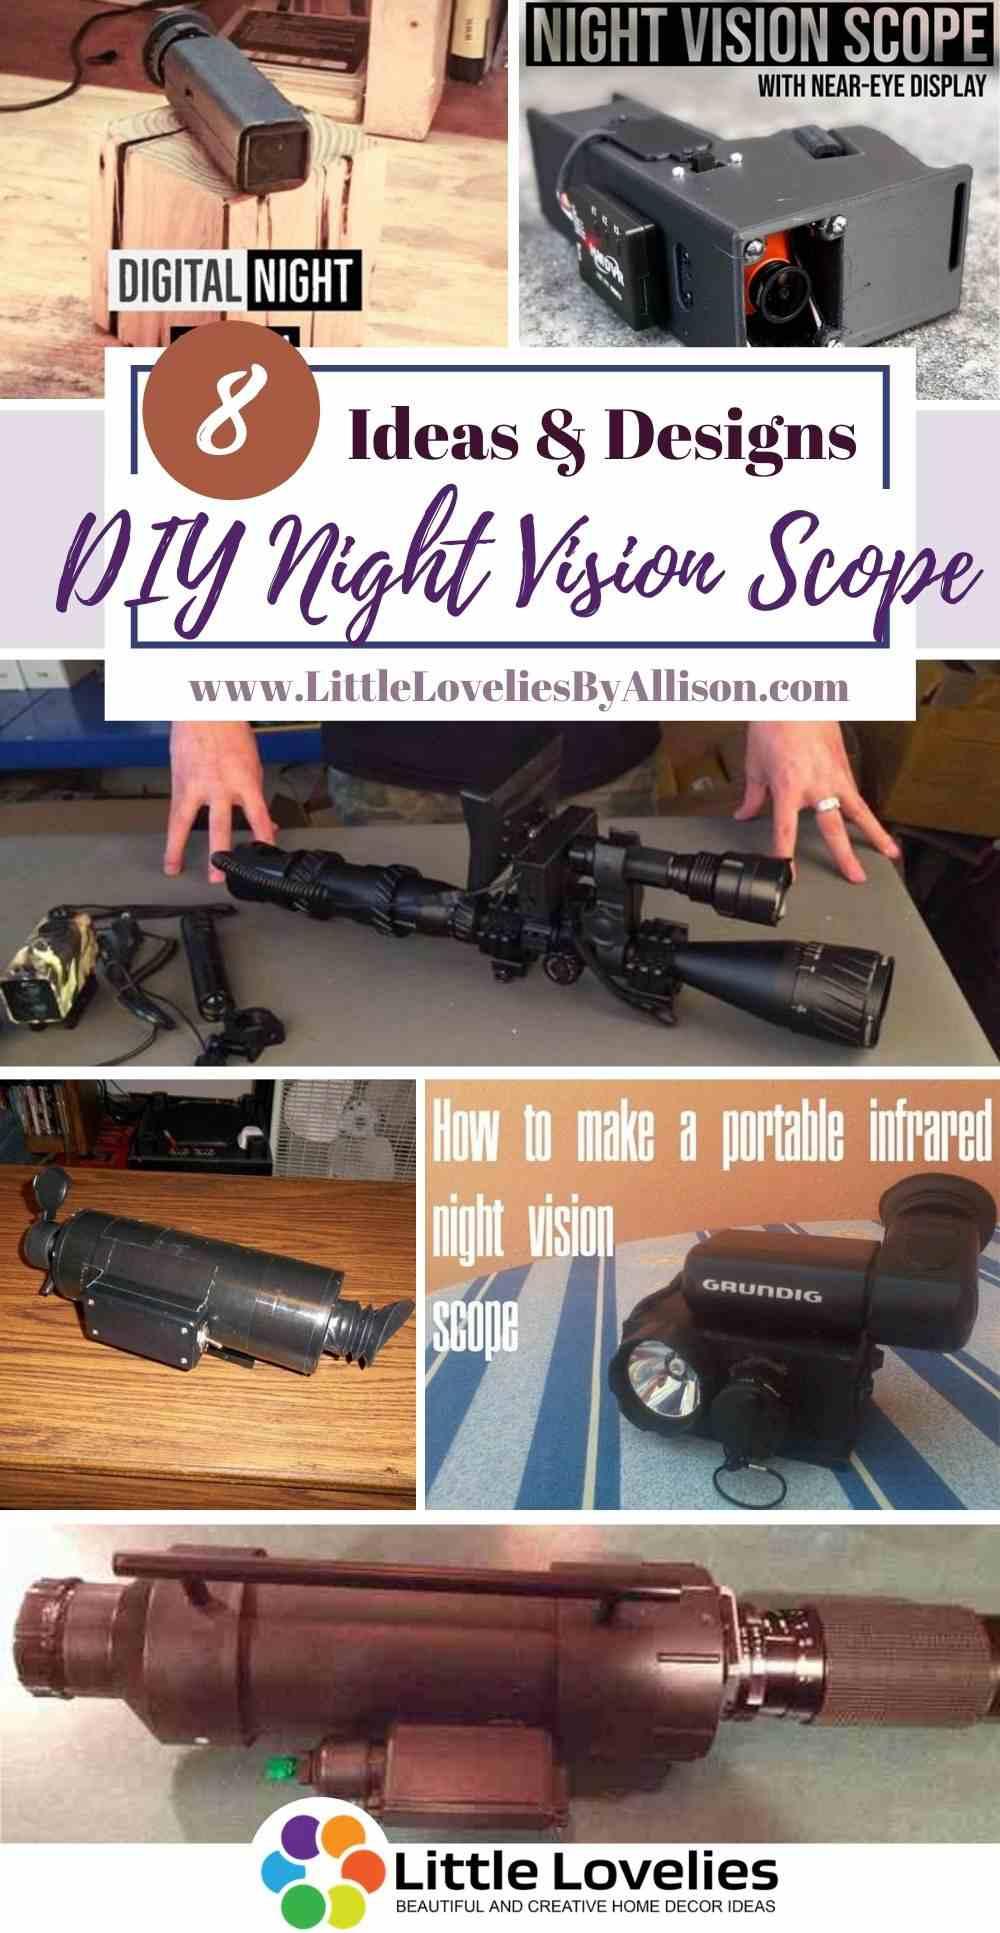 Best-Homemade-DIY-Night-Vision-Scope